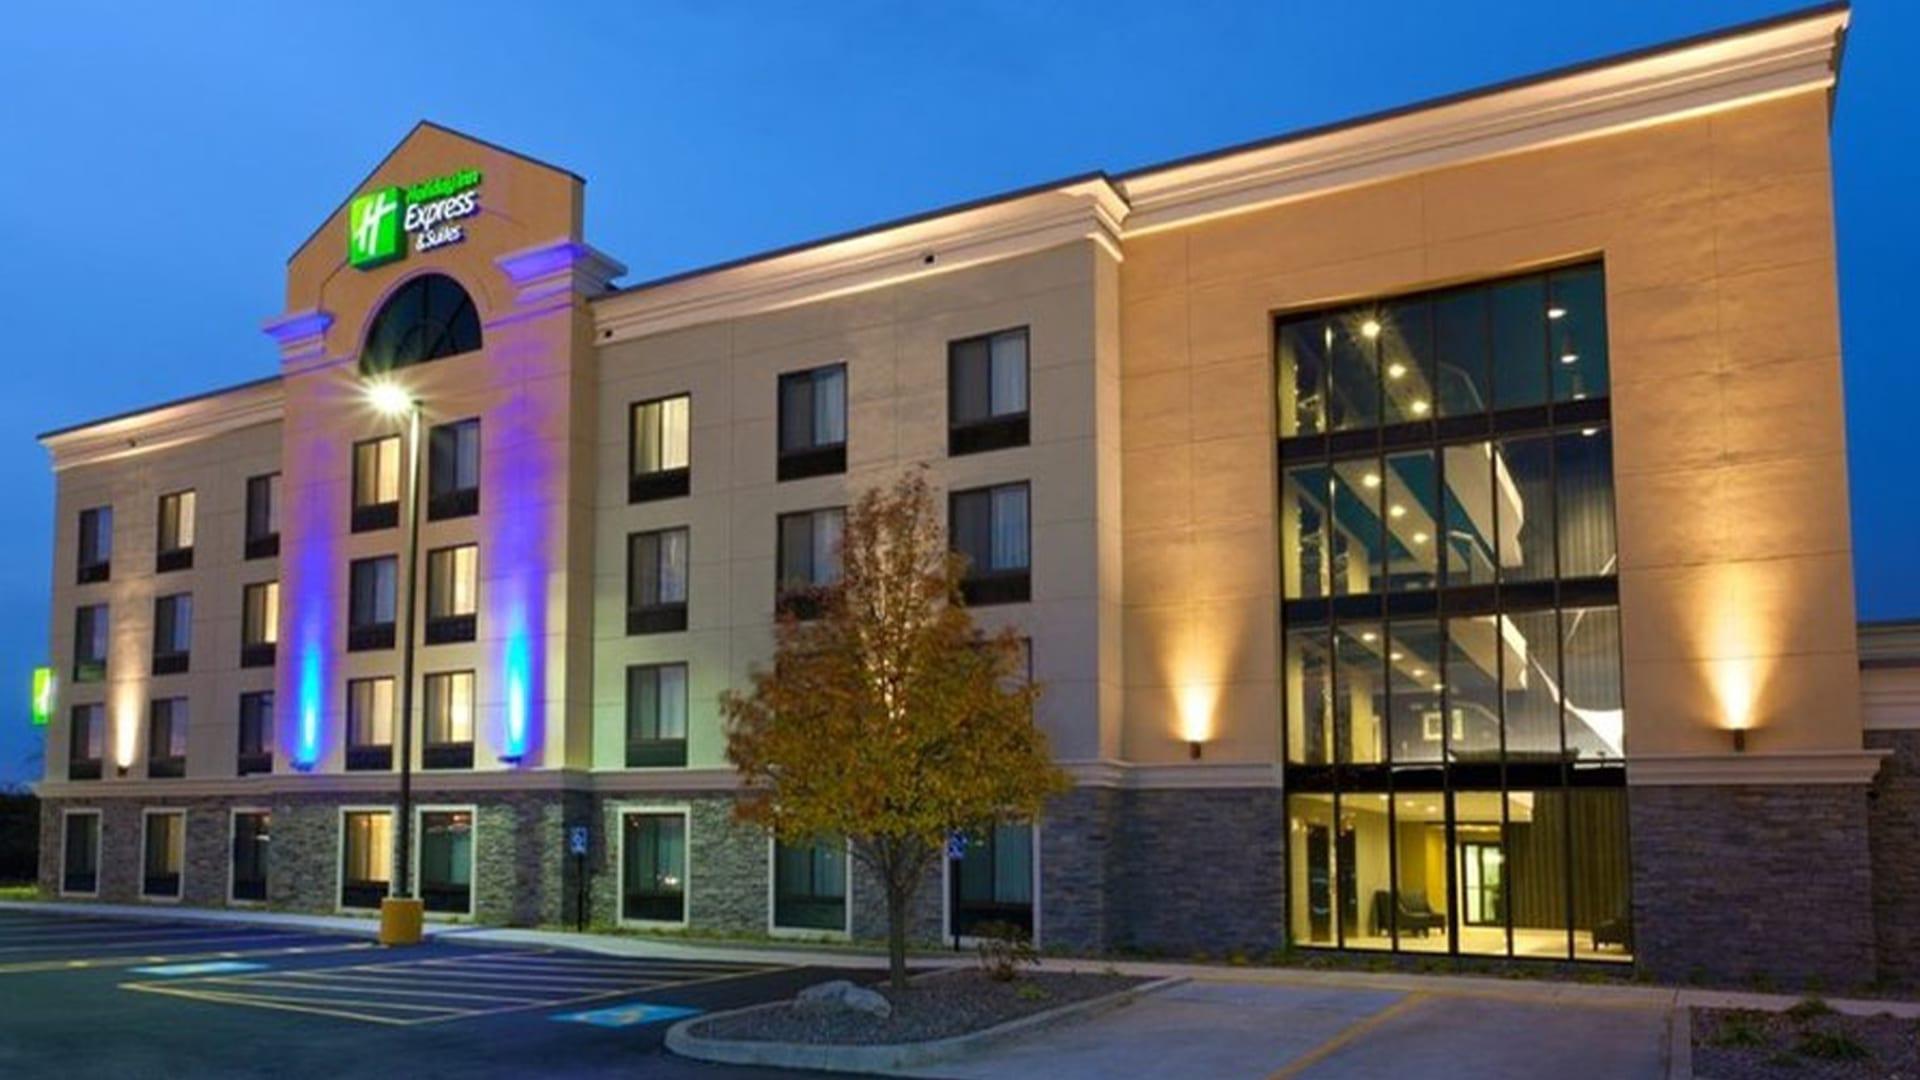 Holiday Inn Express Hotel Builder Engineer